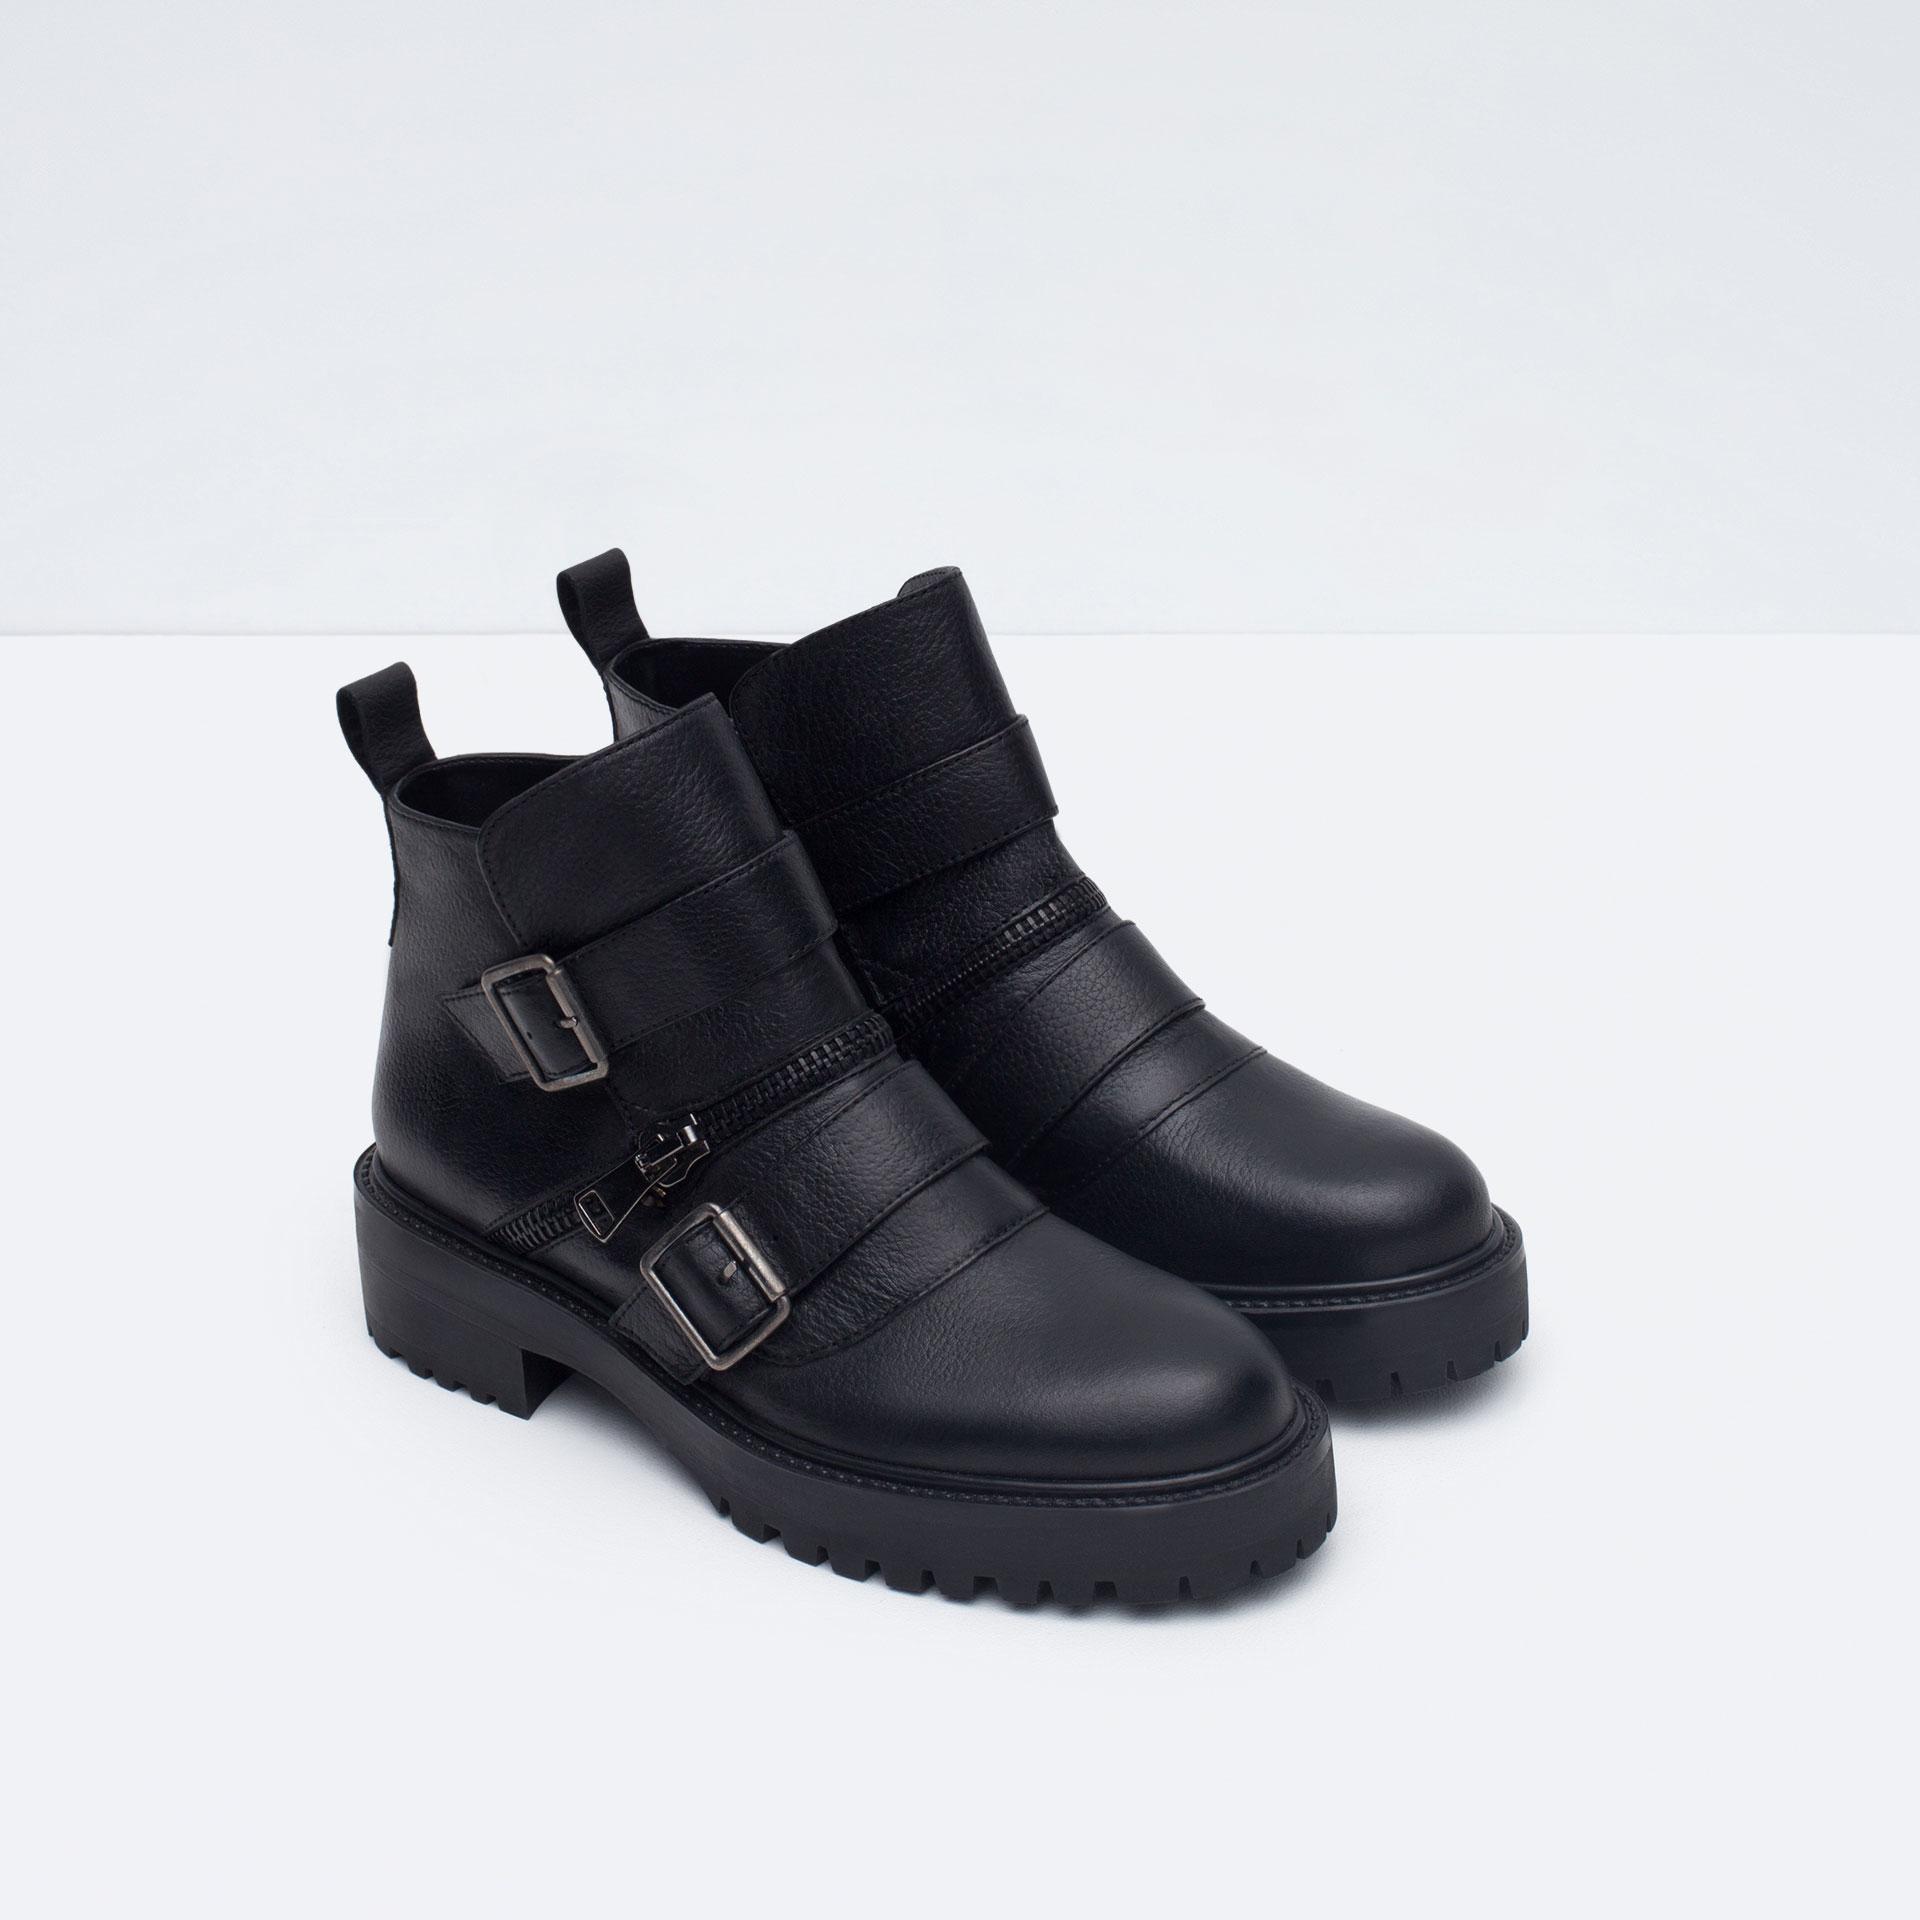 Zara Buckled Leather Biker Boot In Black Lyst